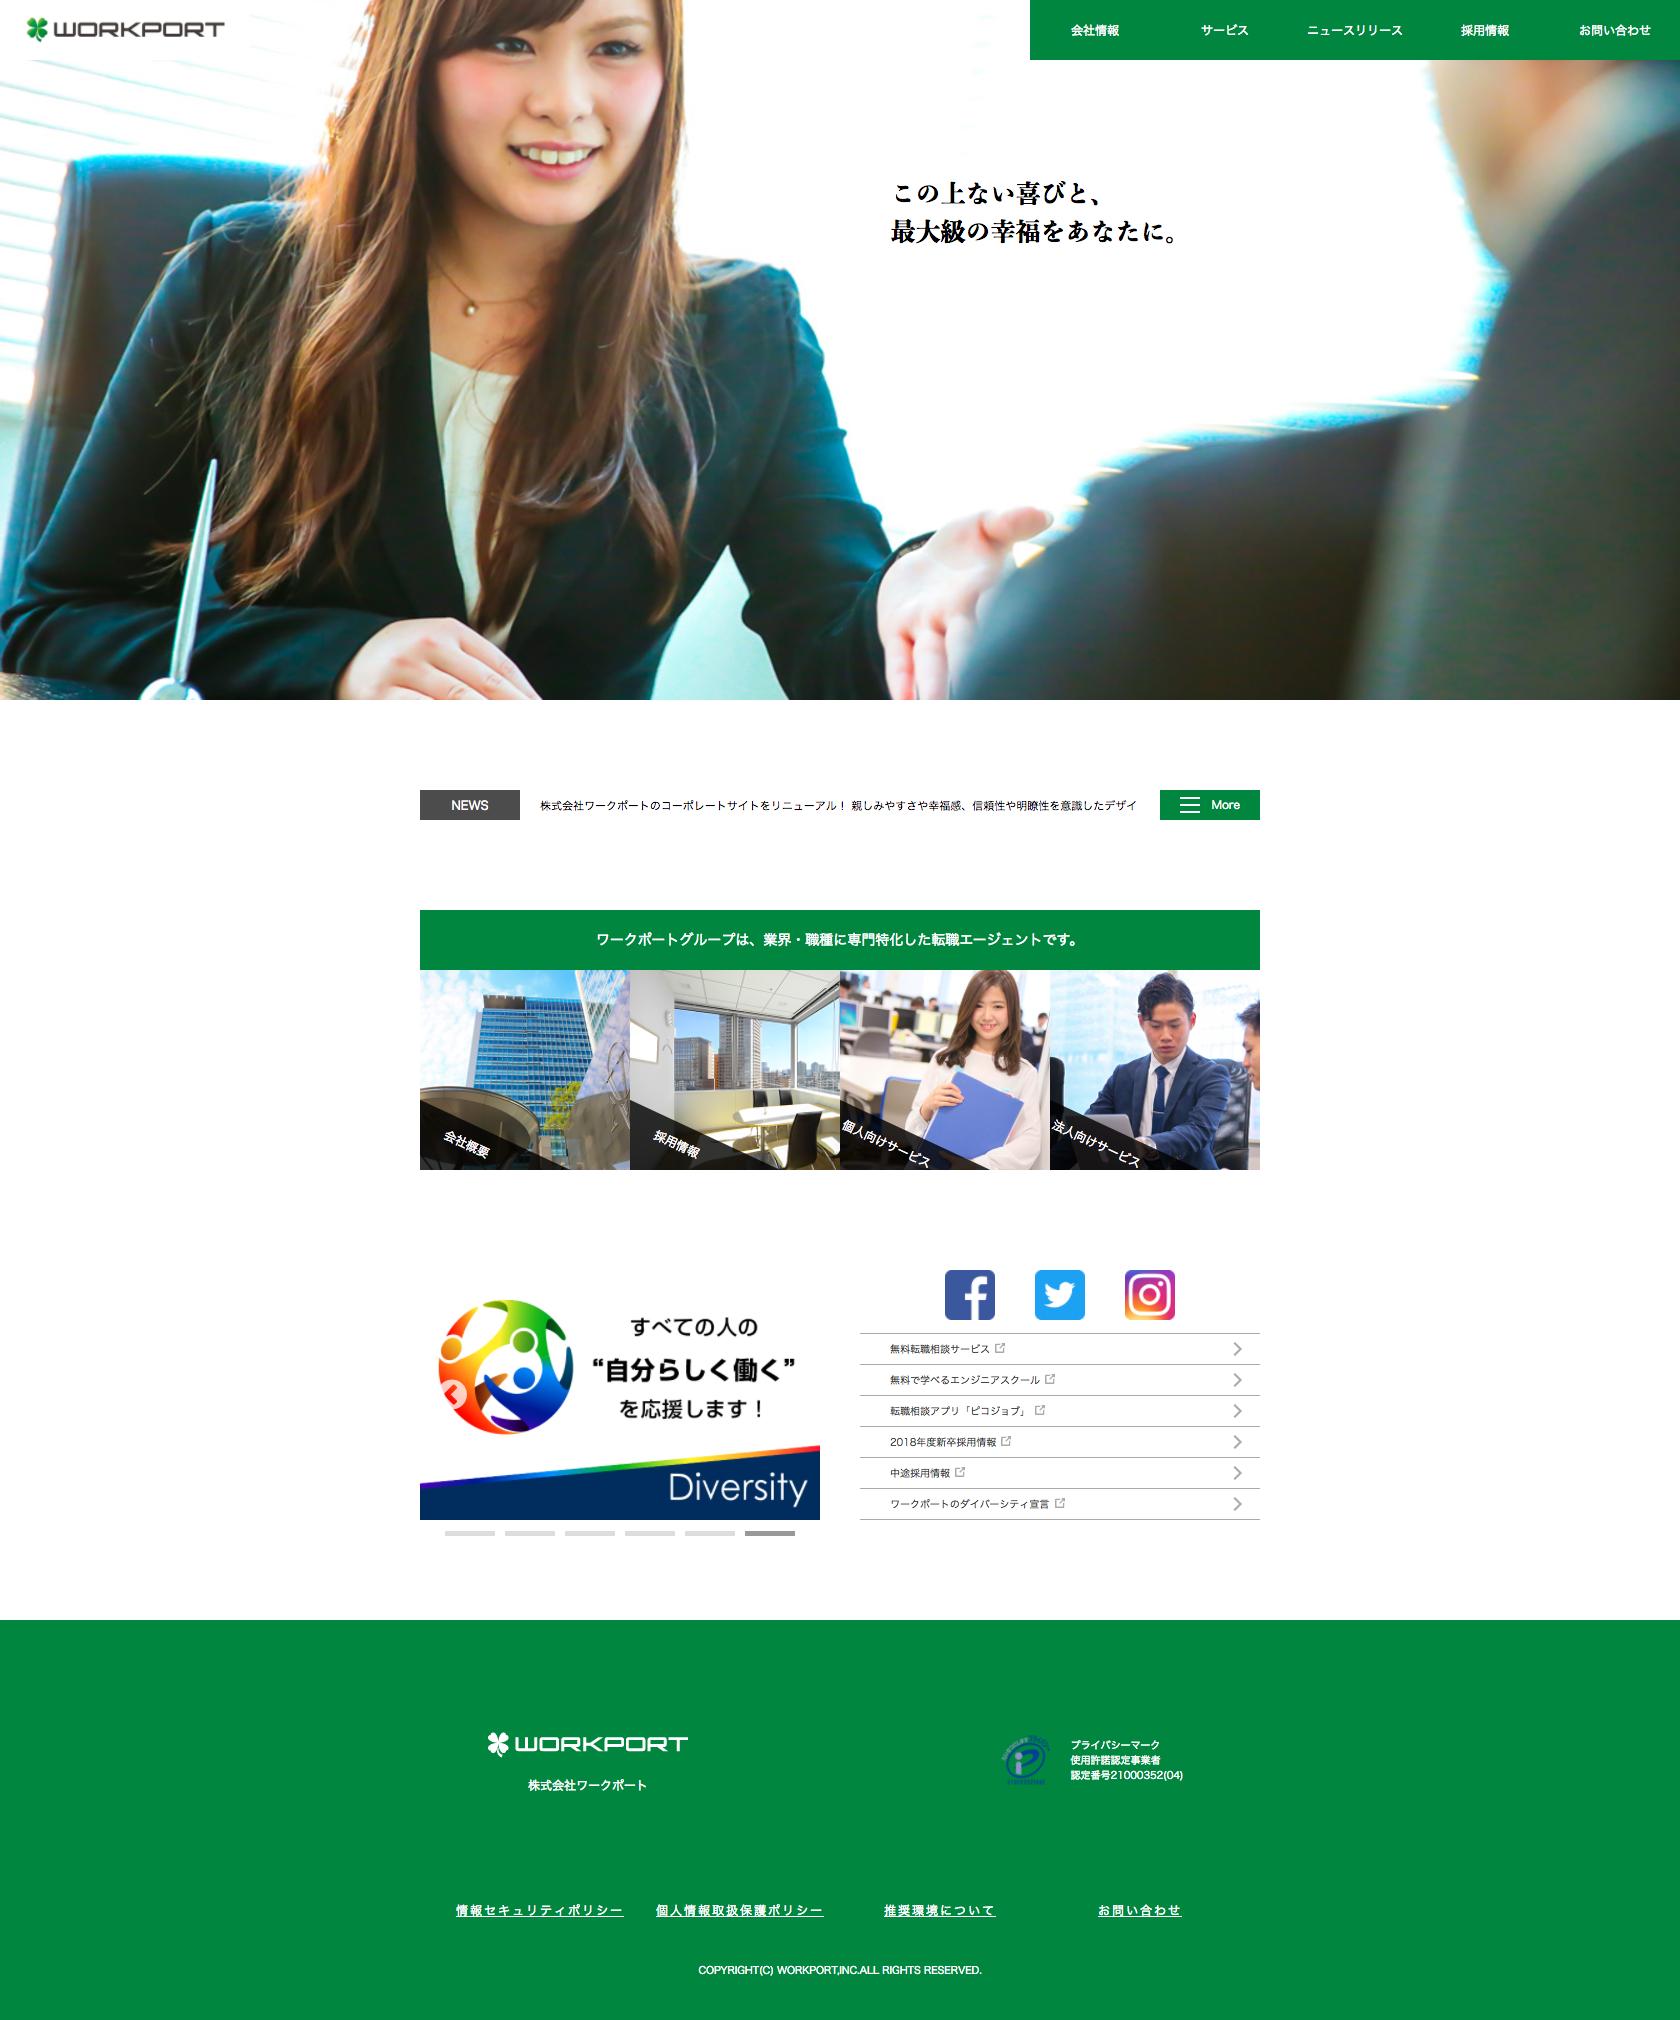 screencapture-workport-co-jp-corporate-1501647780437